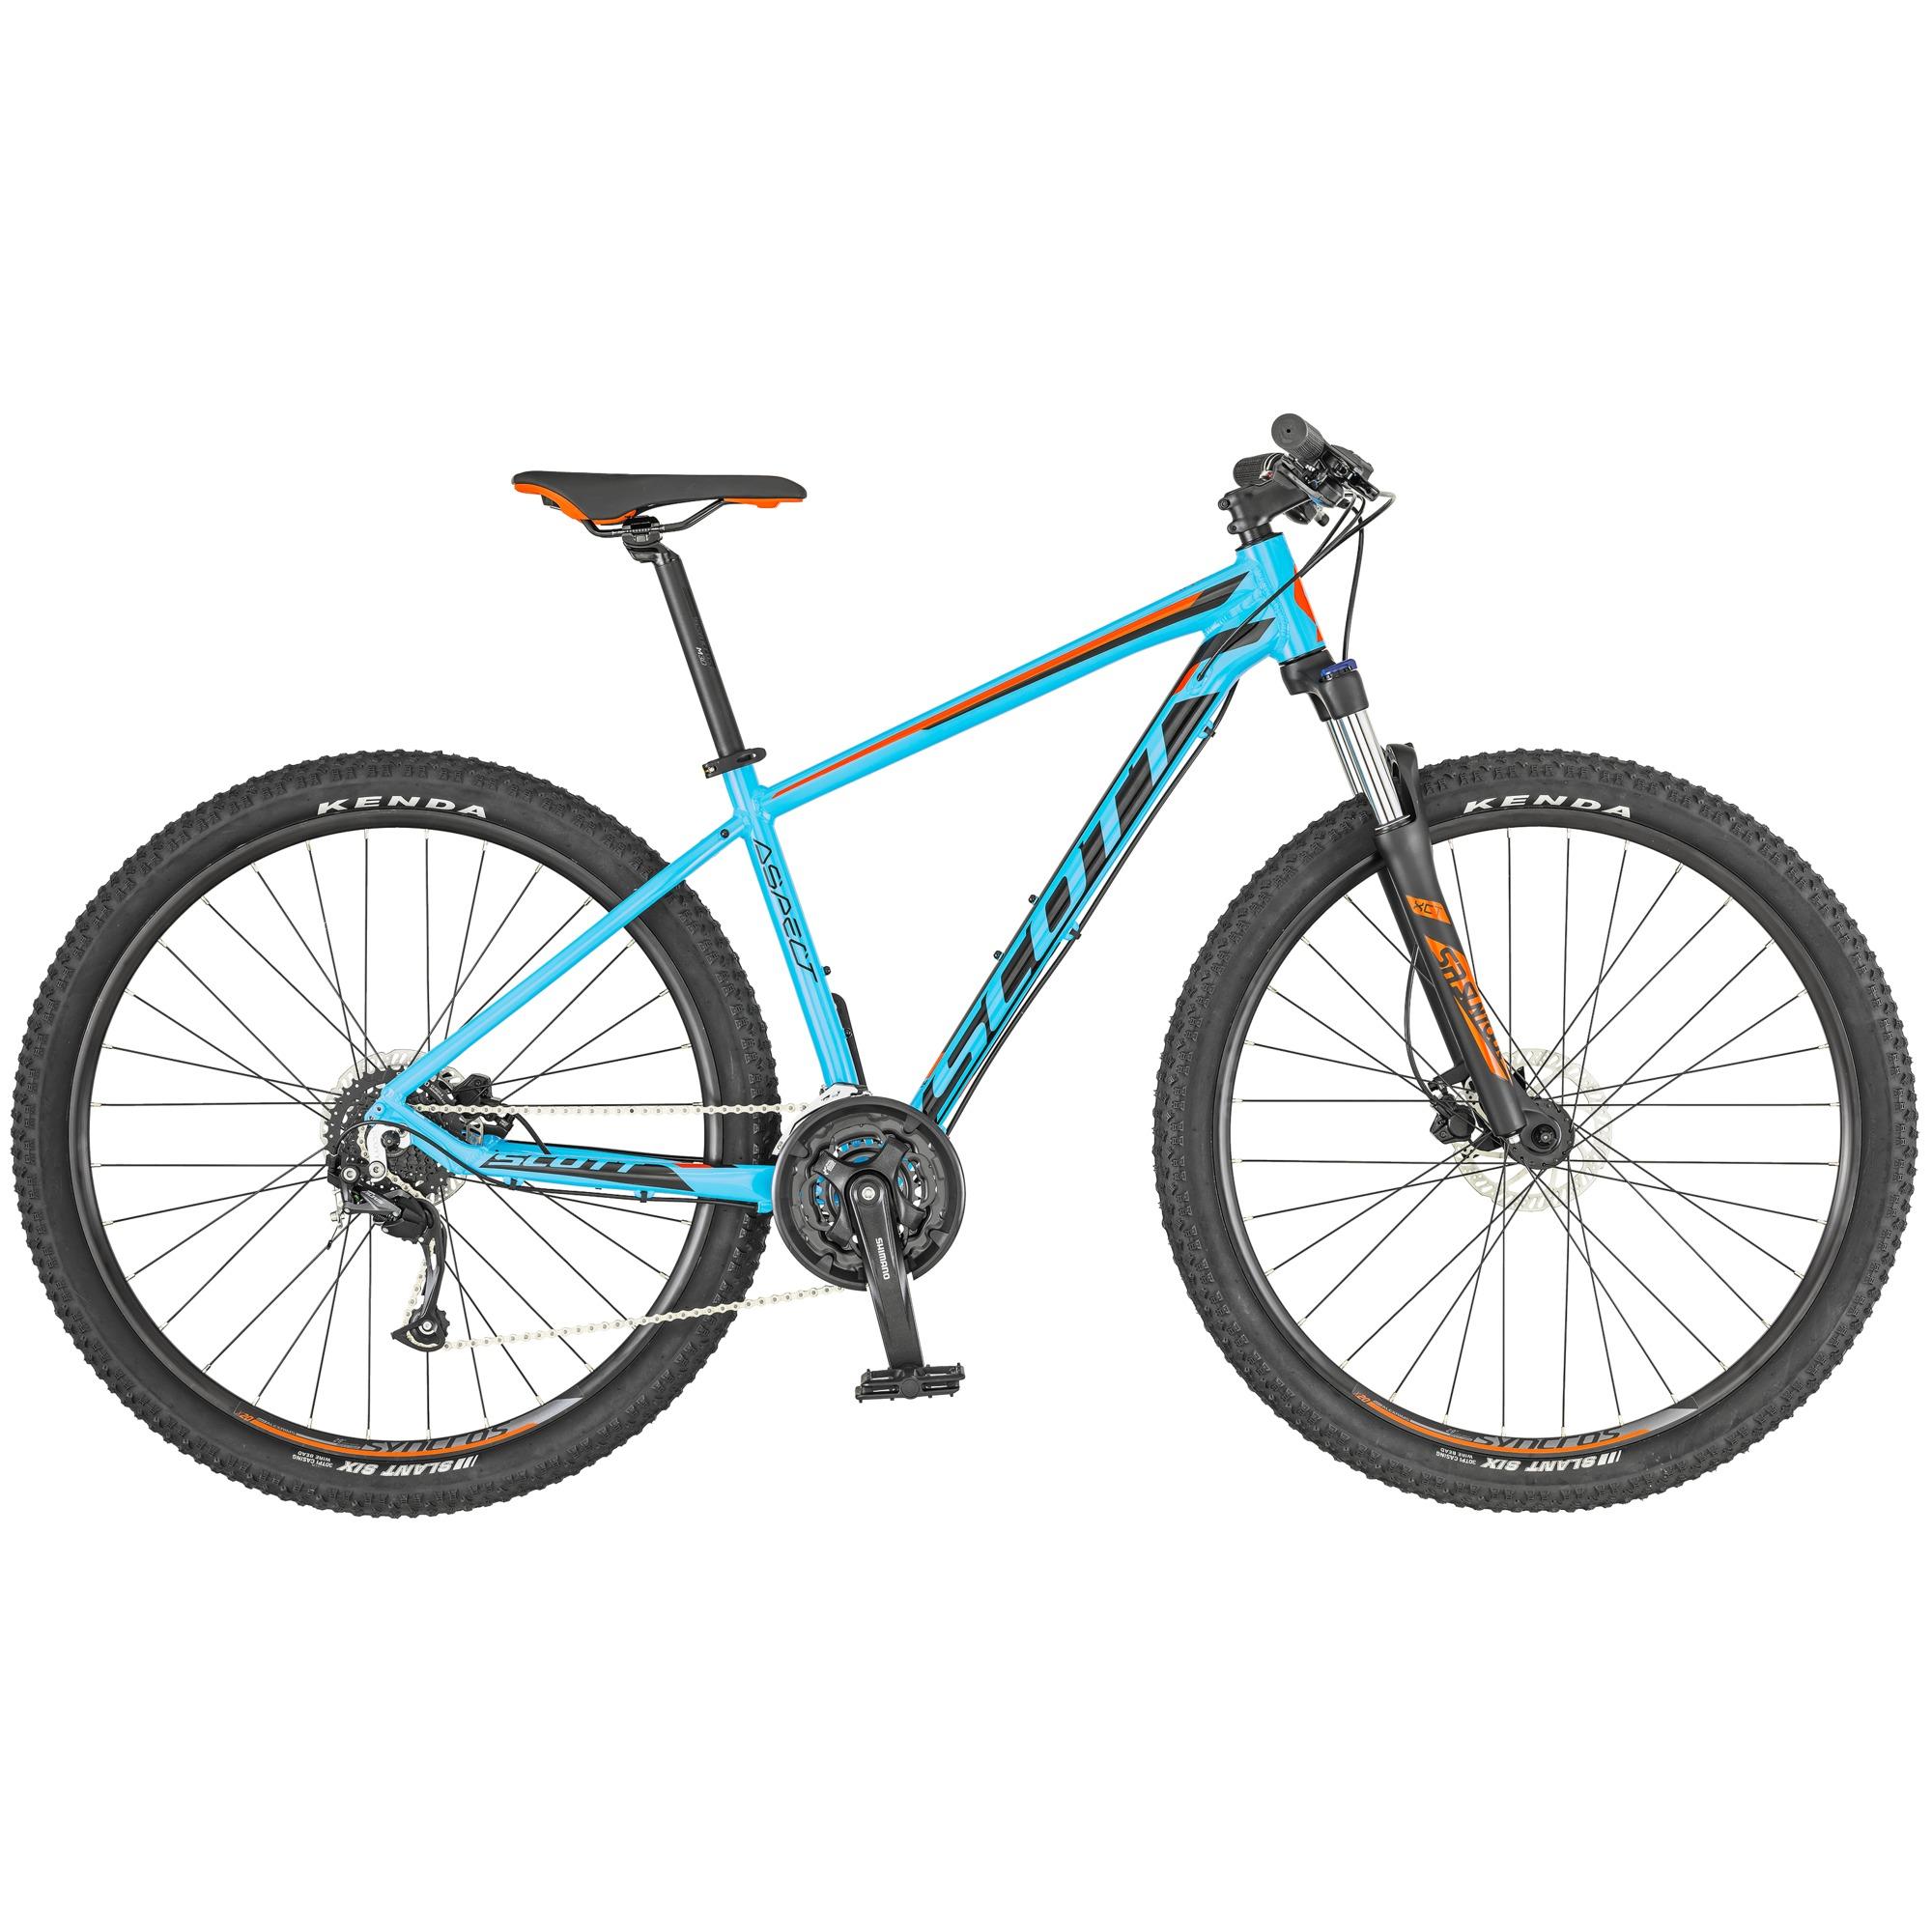 SCOTT Aspect 950 Light blue/Red Bike L - Fahrrad online kaufen | Online Shop Bike Profis